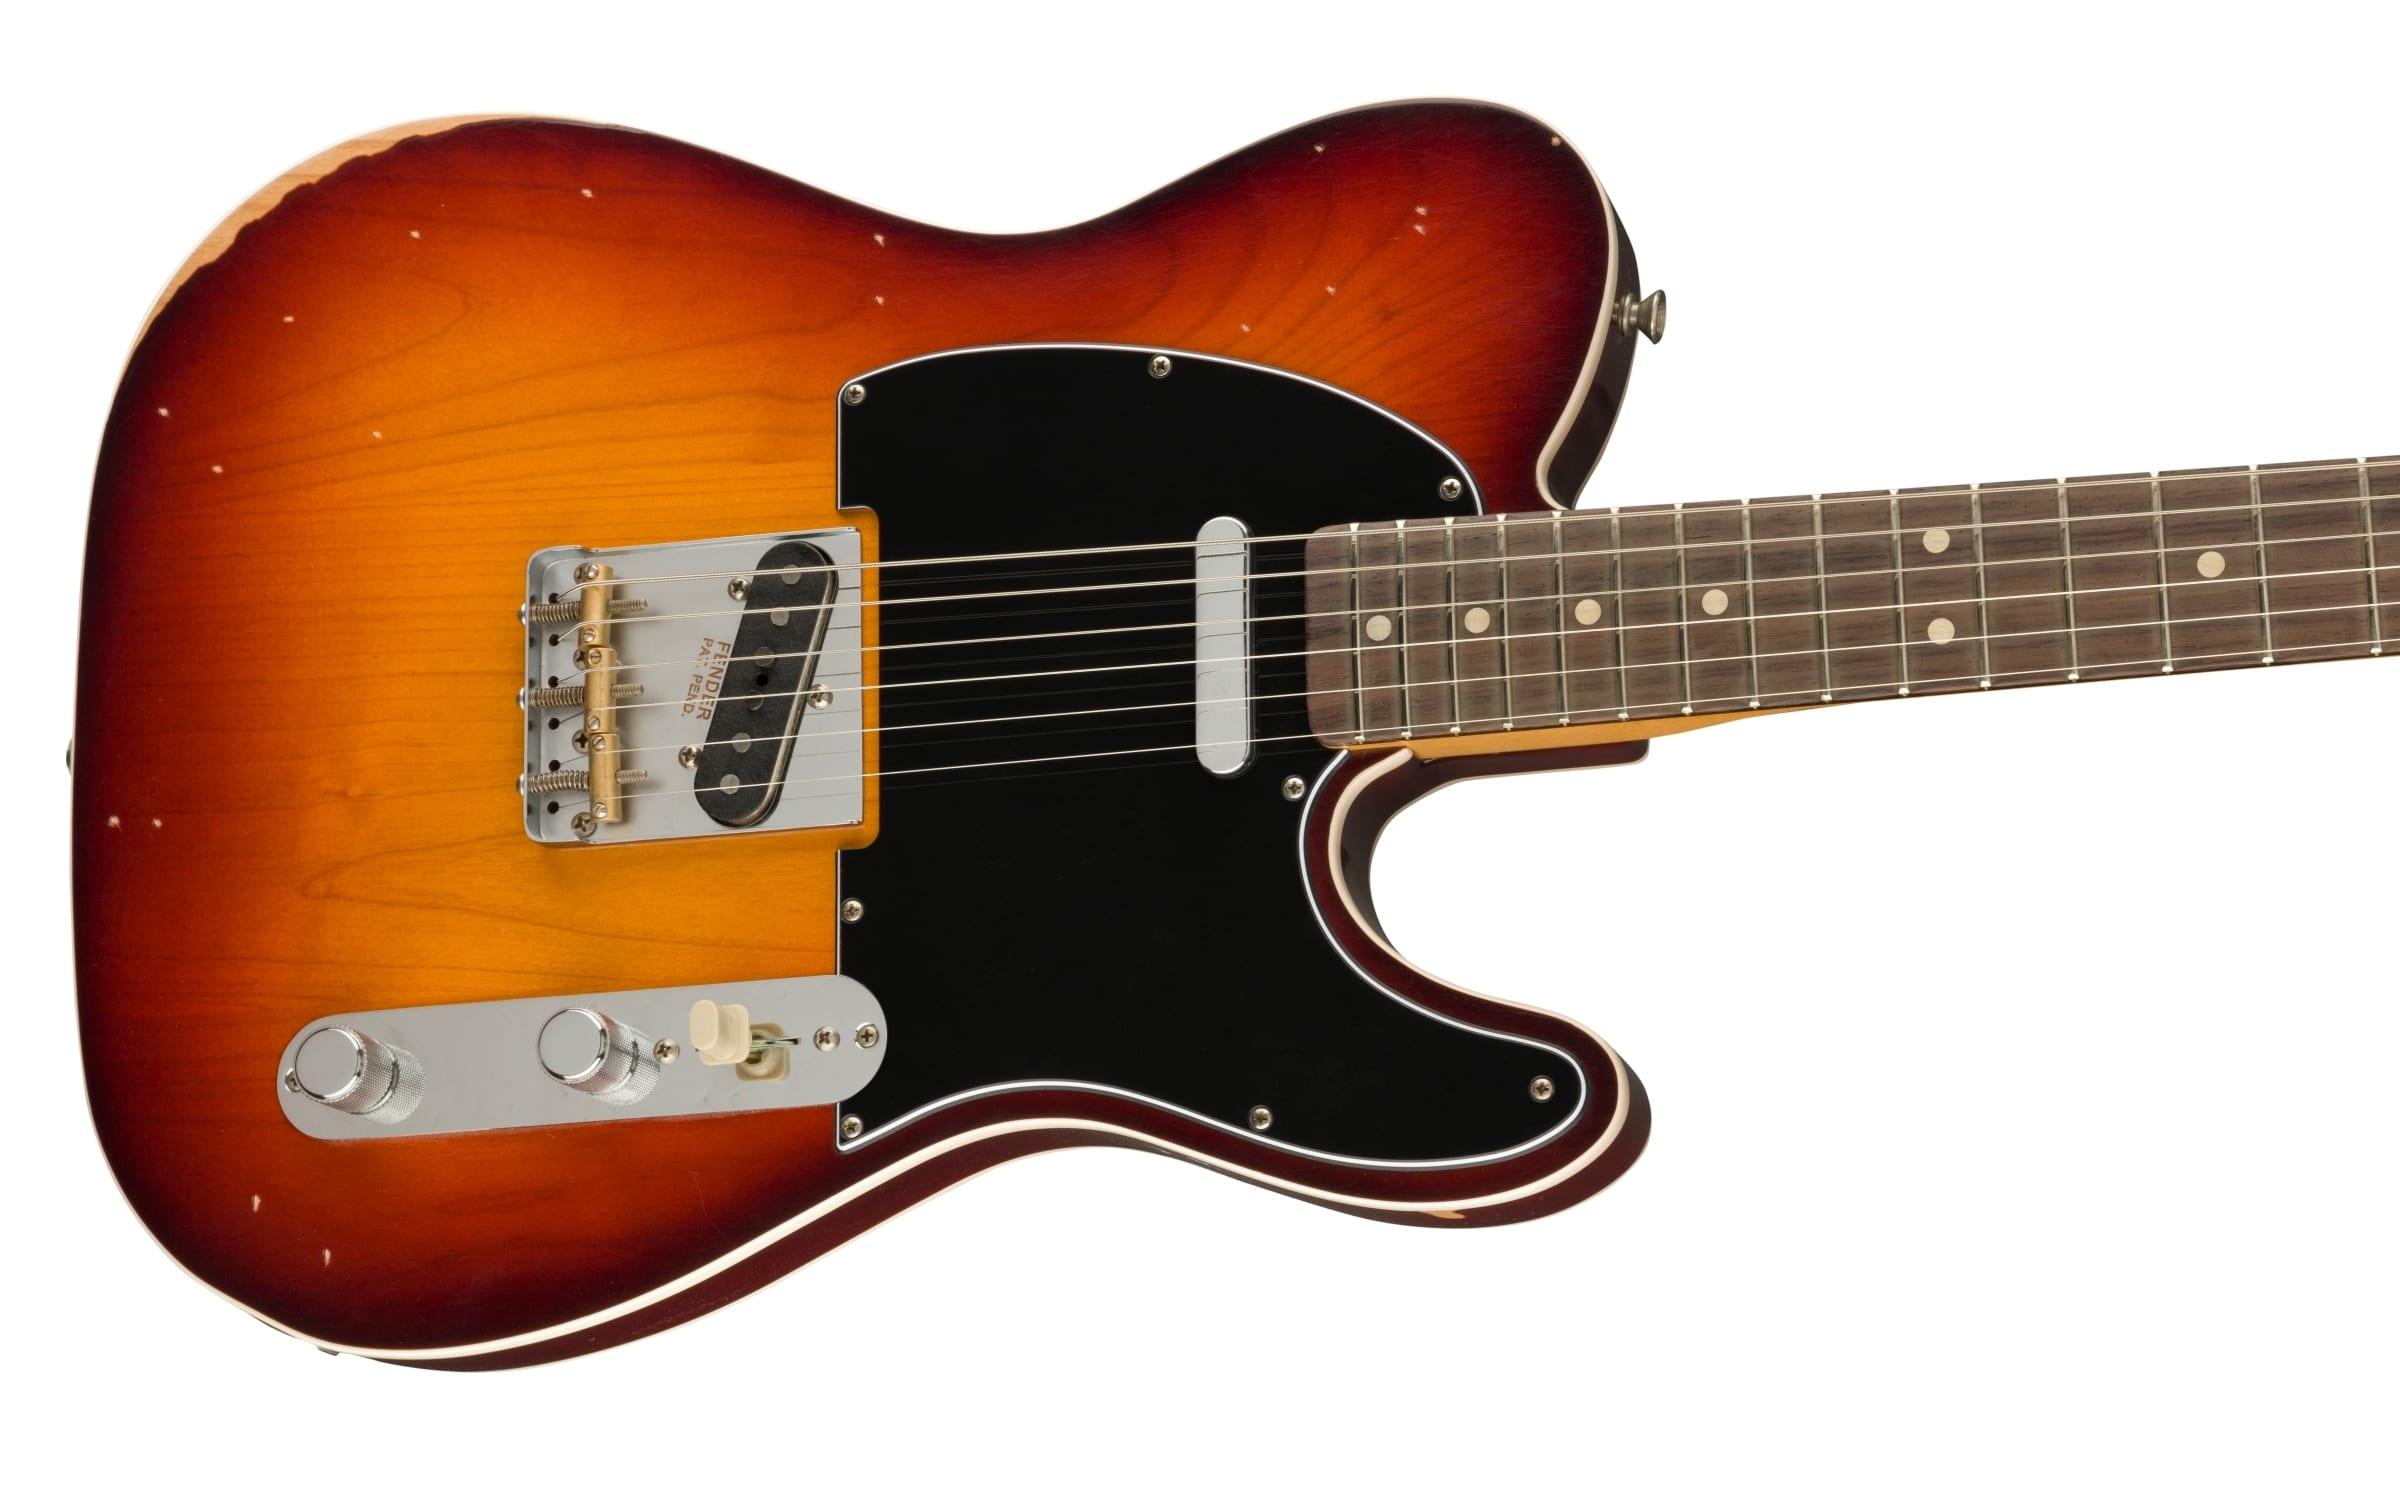 Fender Road Worn Jason Isbell Signature Custom Telecaster with aged finish